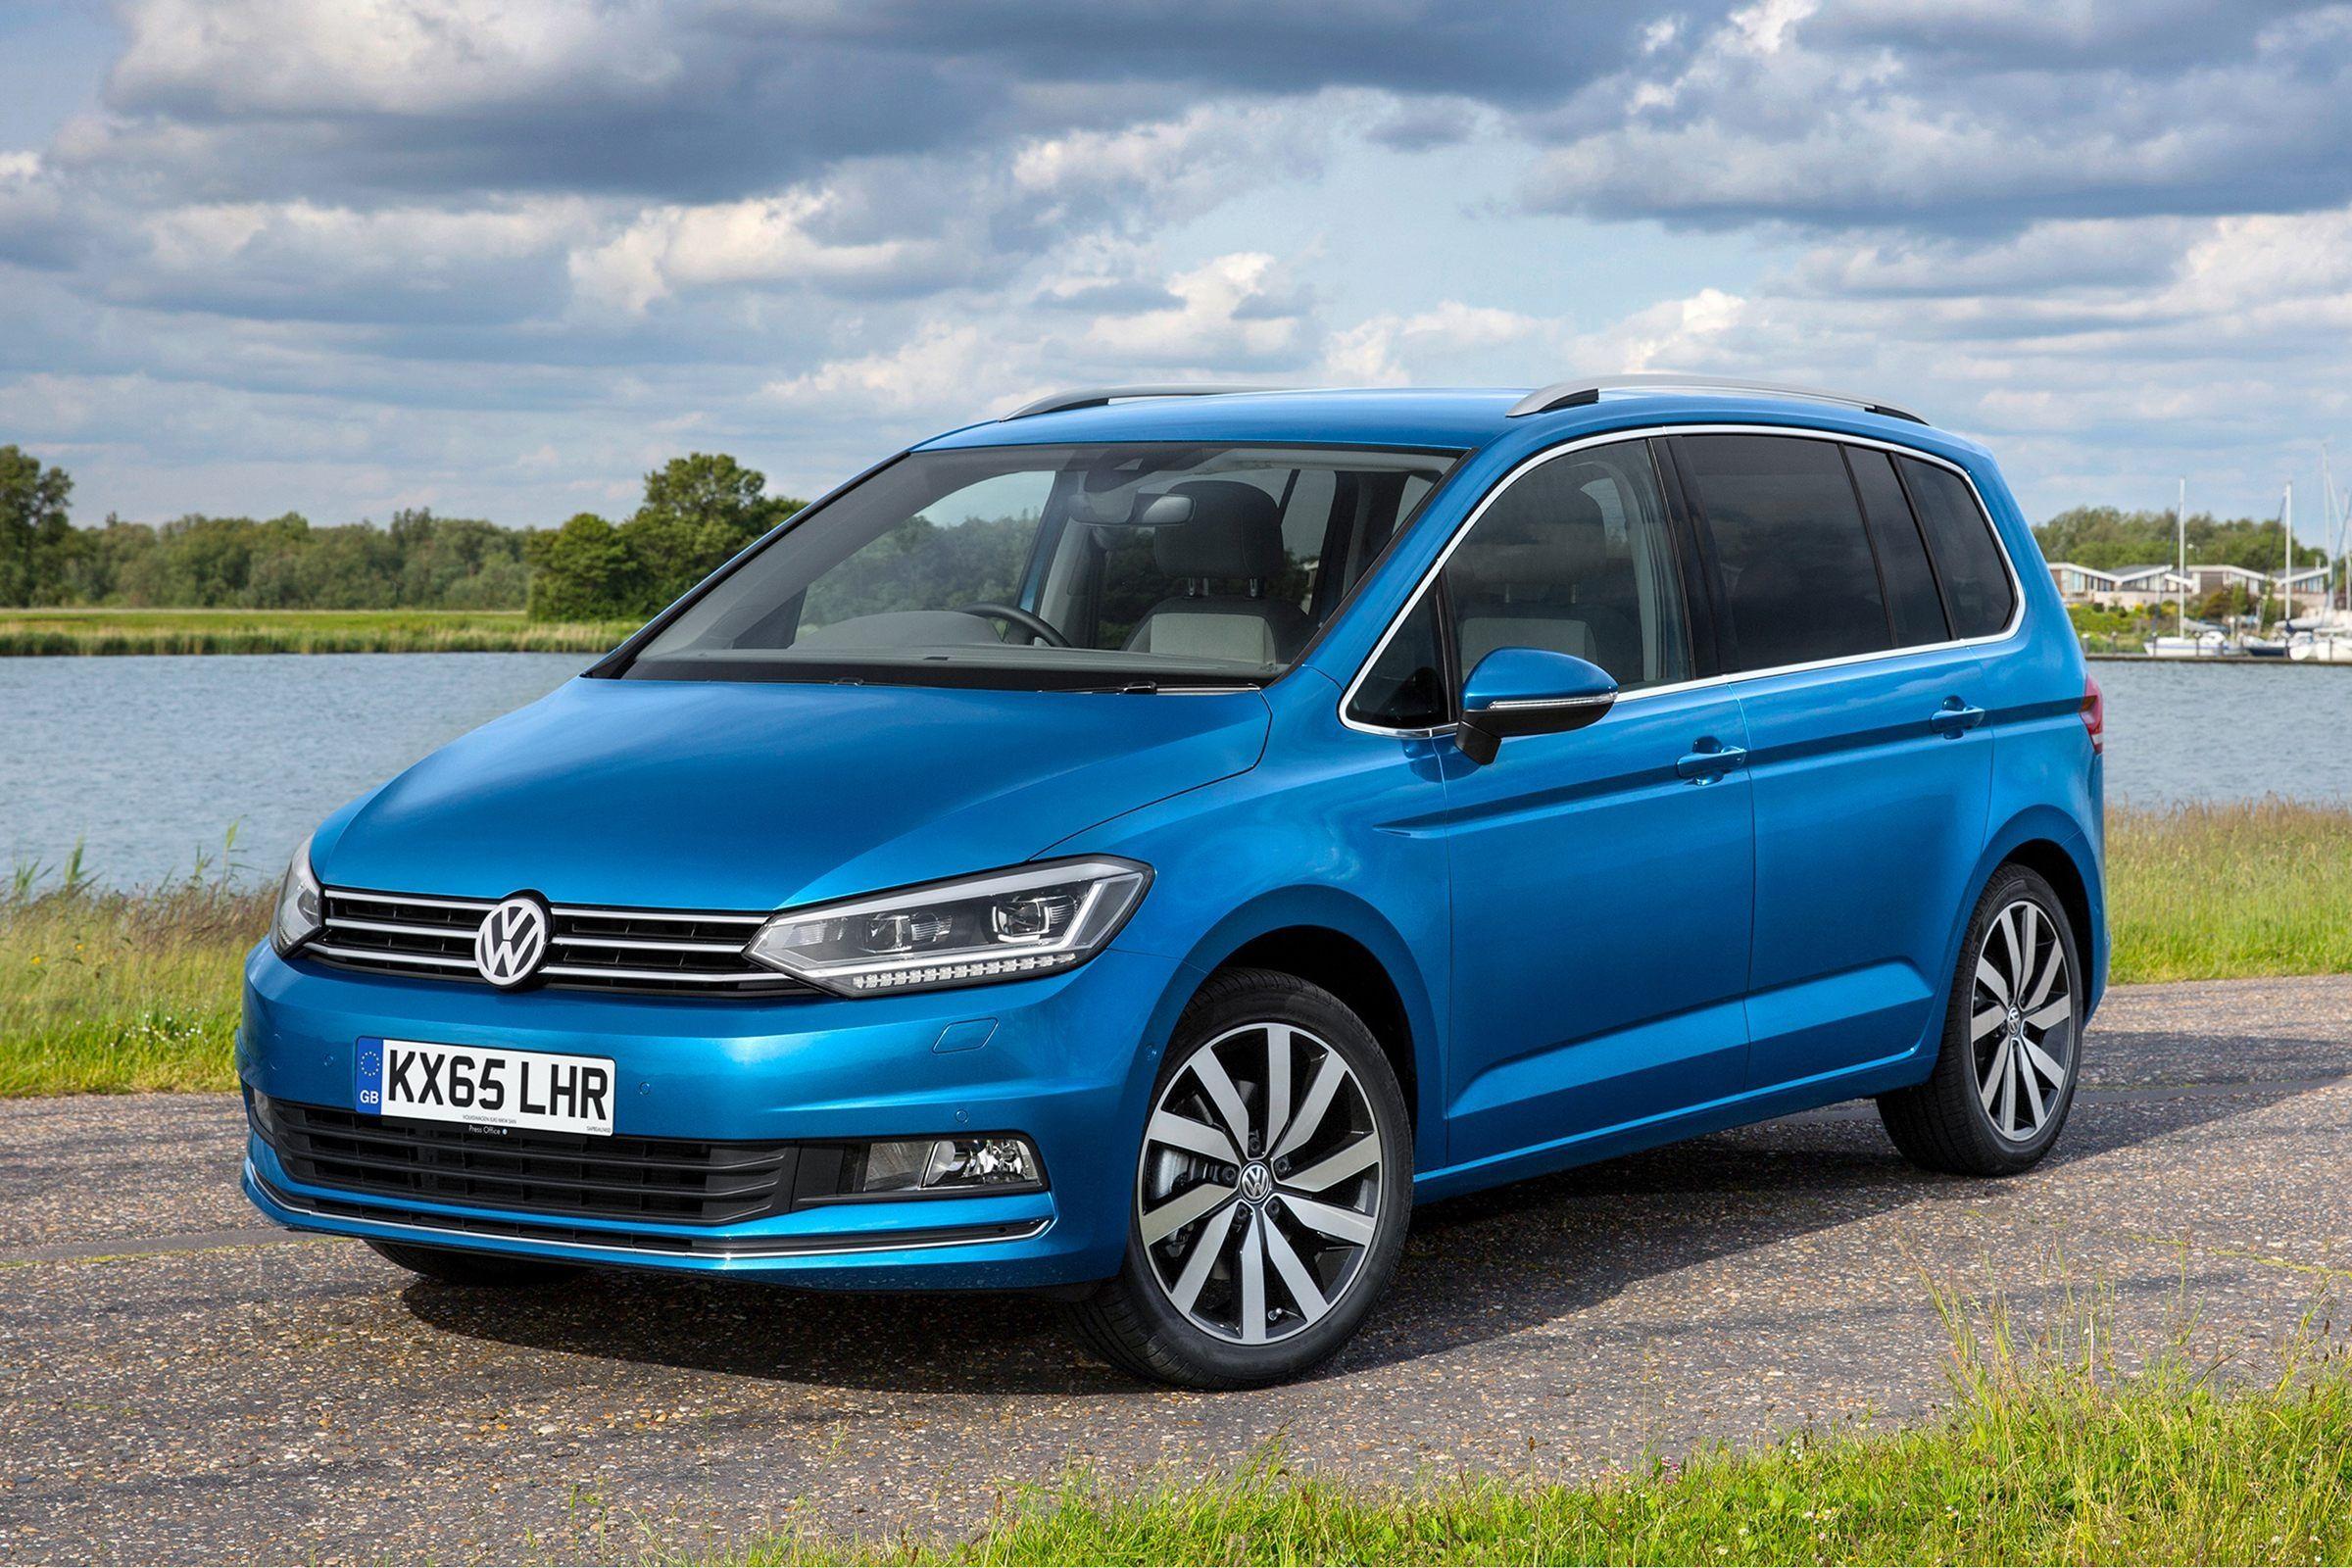 The VW Touran 2019 isn't close to luxurious, but it's hard ...